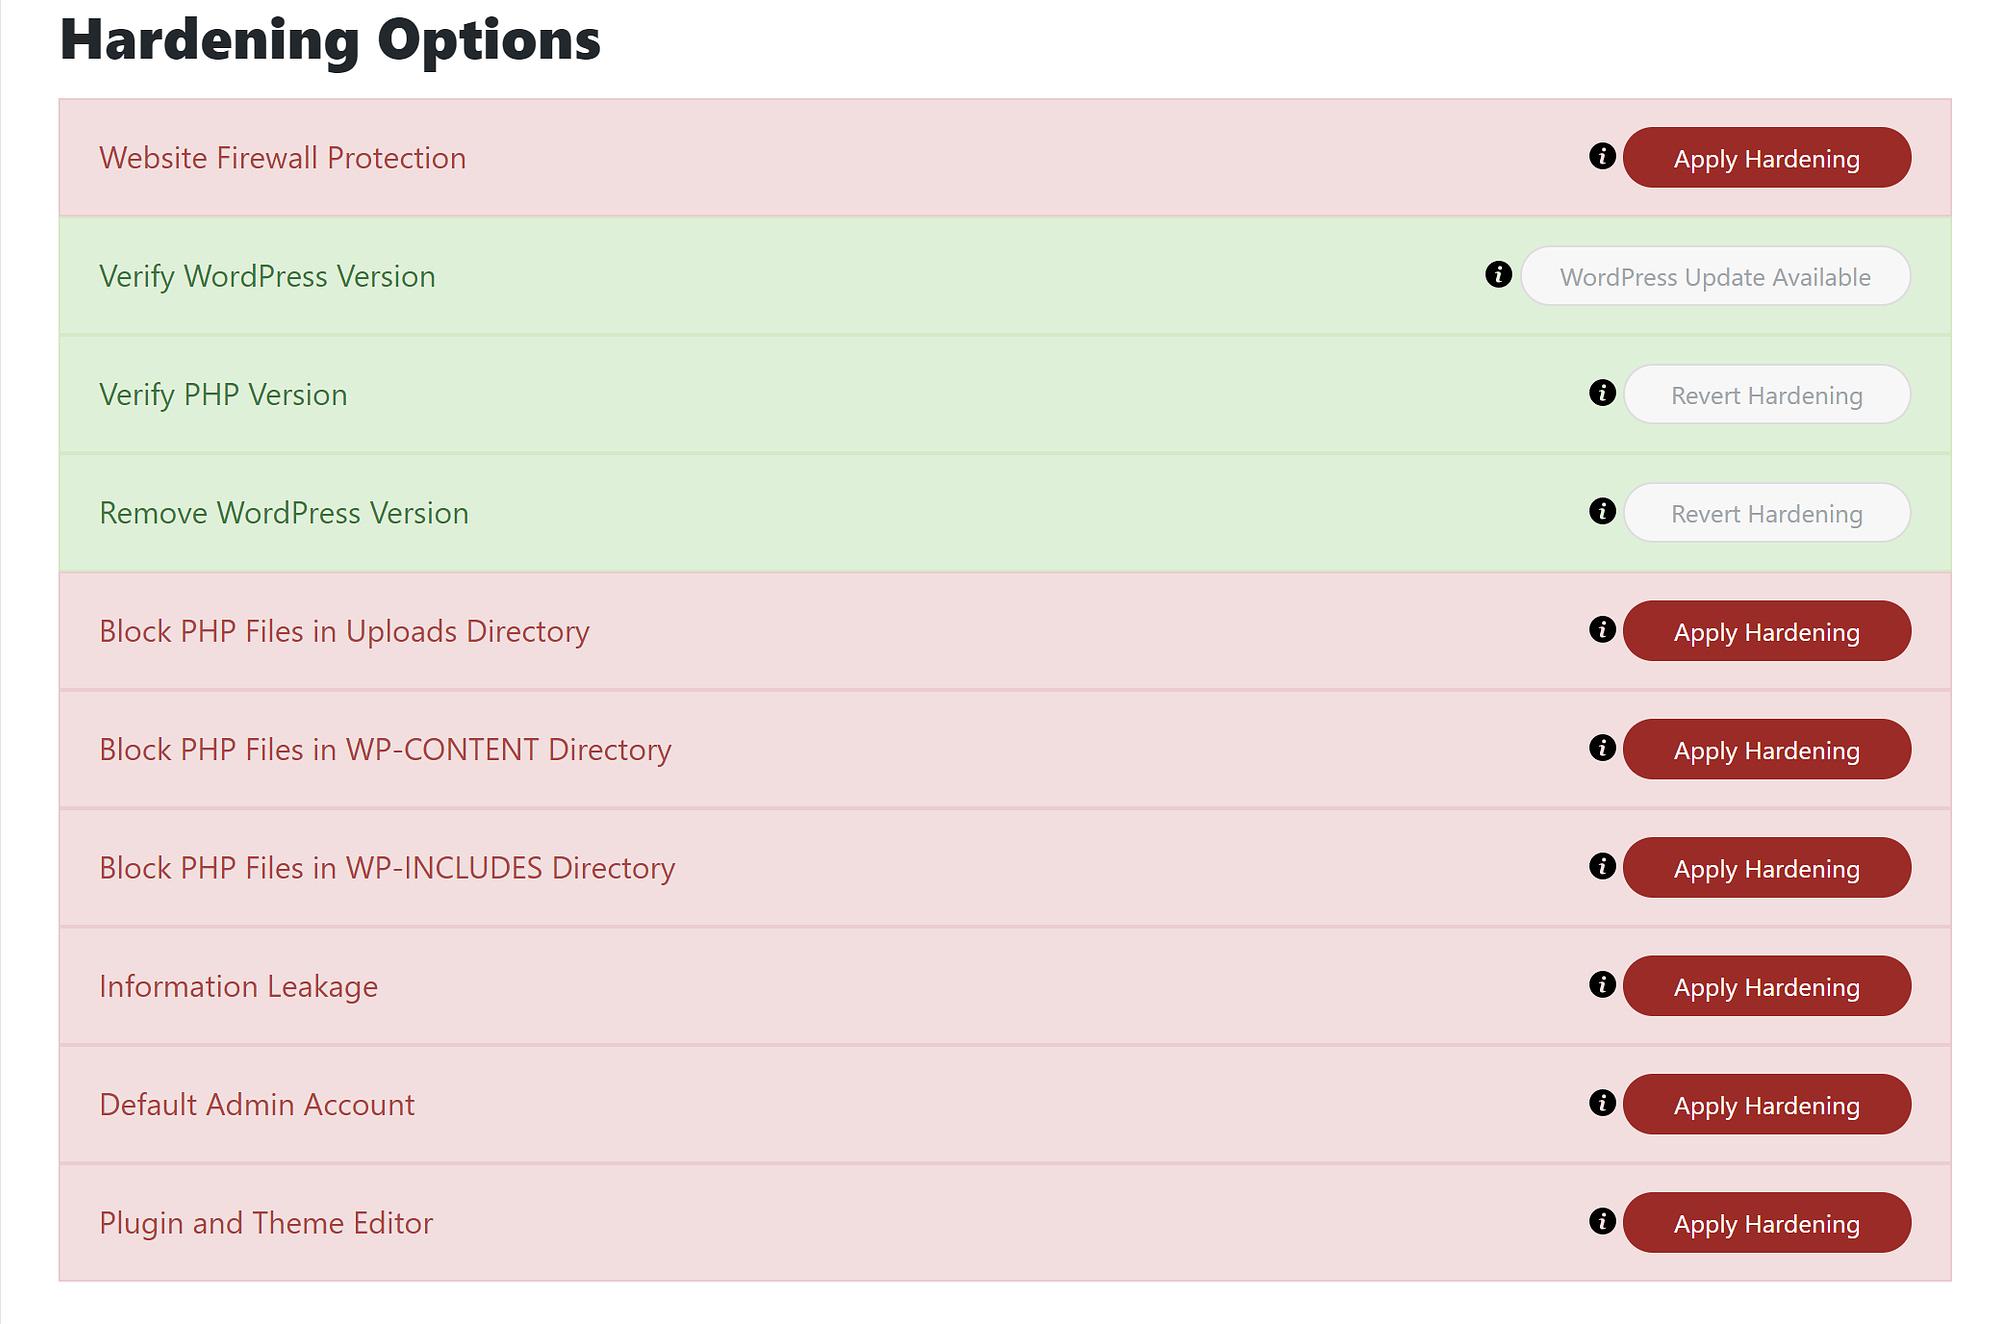 Sucuri hardening options